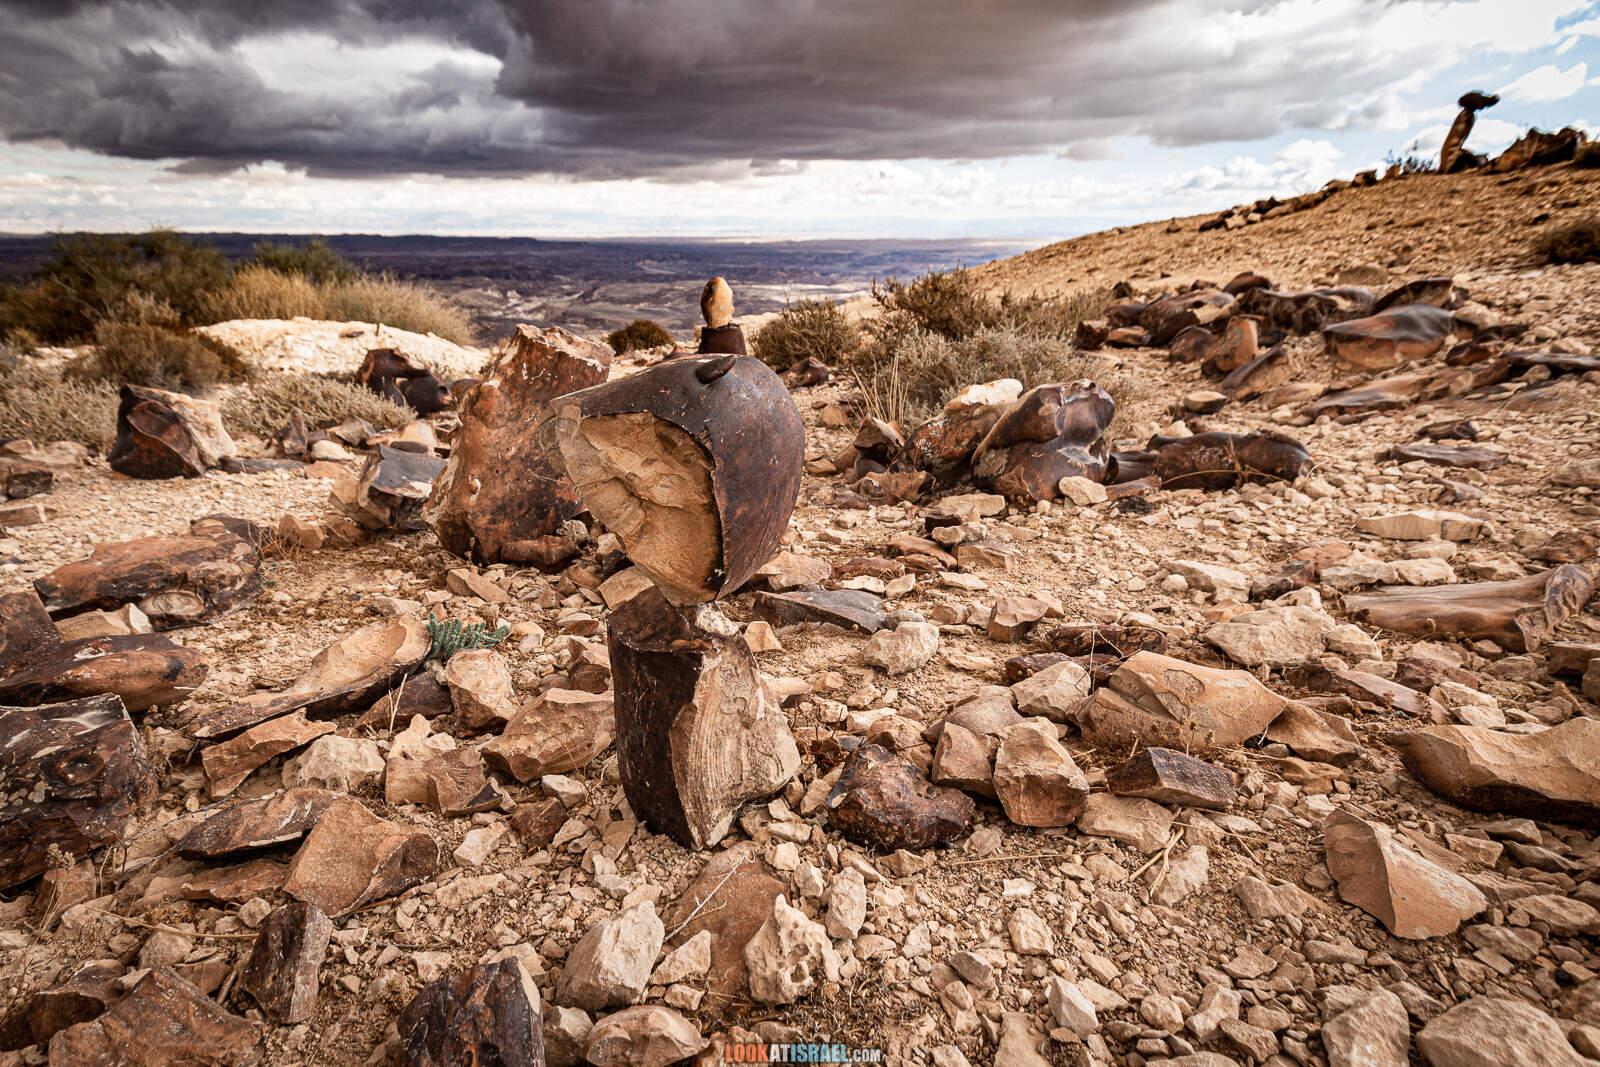 Храм эпохи палеолита на горе Карком | The Paleolithic Temple on mount Karkom | המקדש הפליאוליתי בהר כרכום | LookAtIsrael.com - Фото путешествия по Израилю